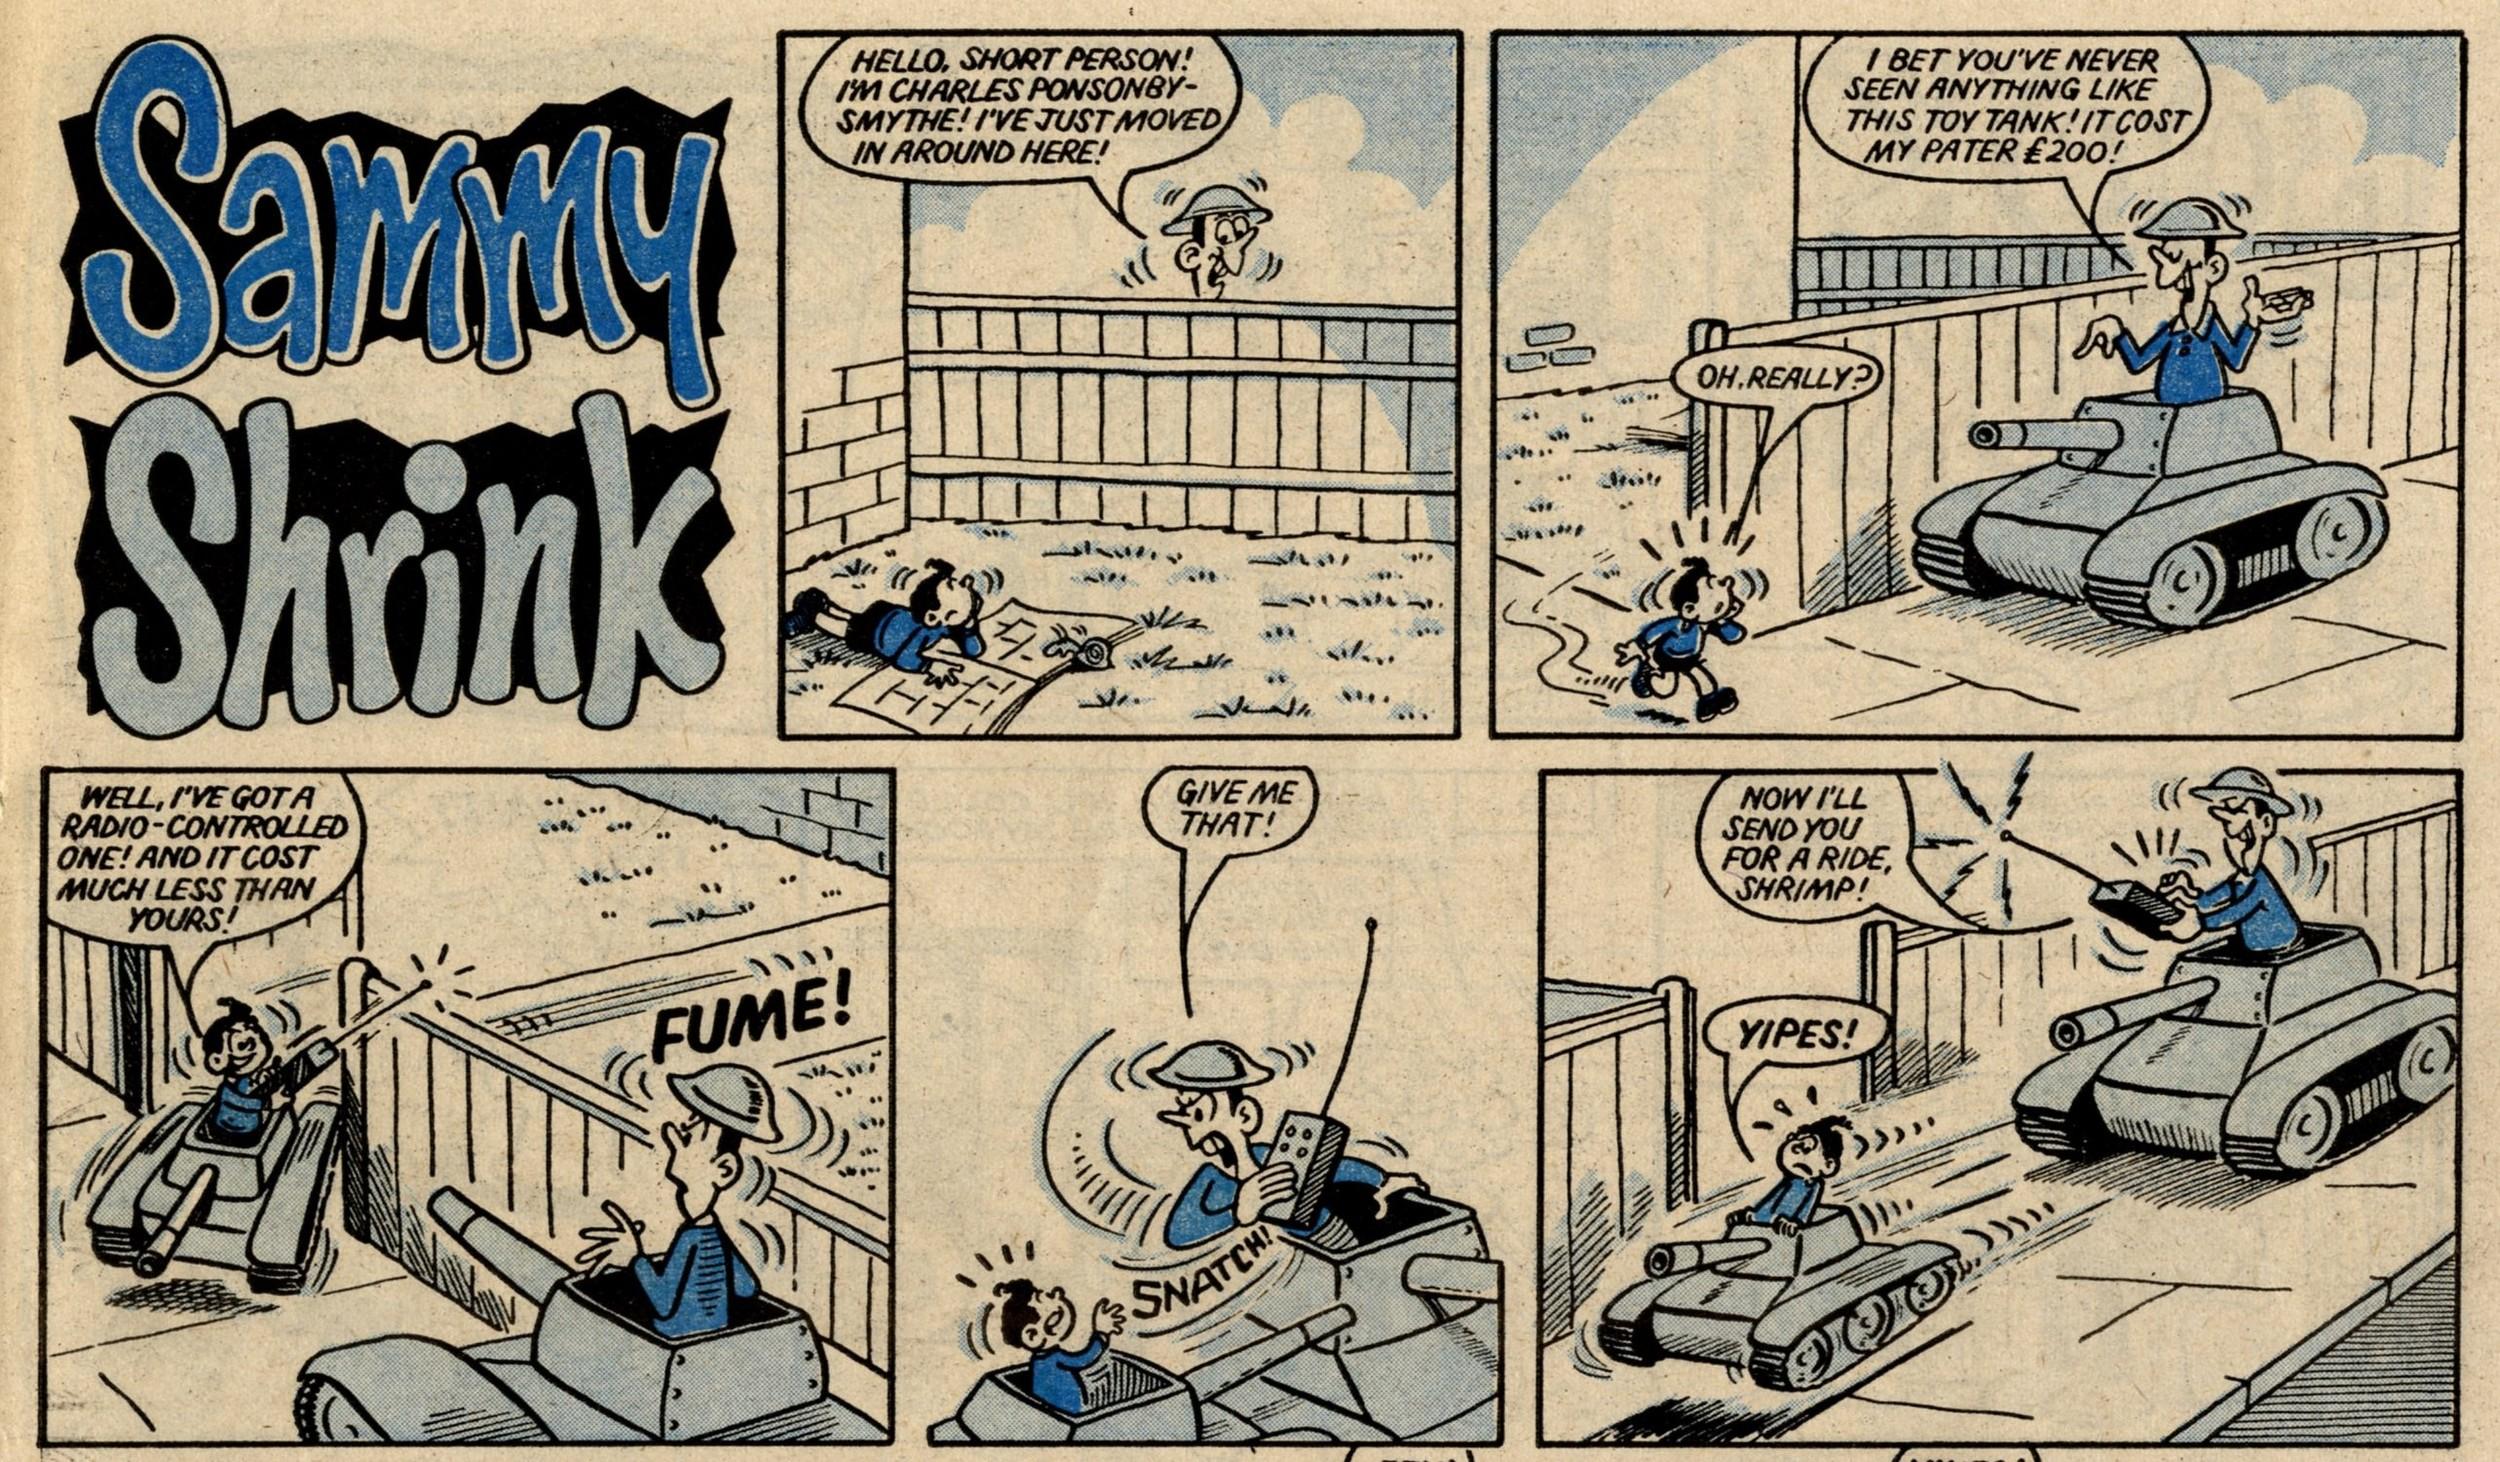 Sammy Shrink: Terry Bave (artist)